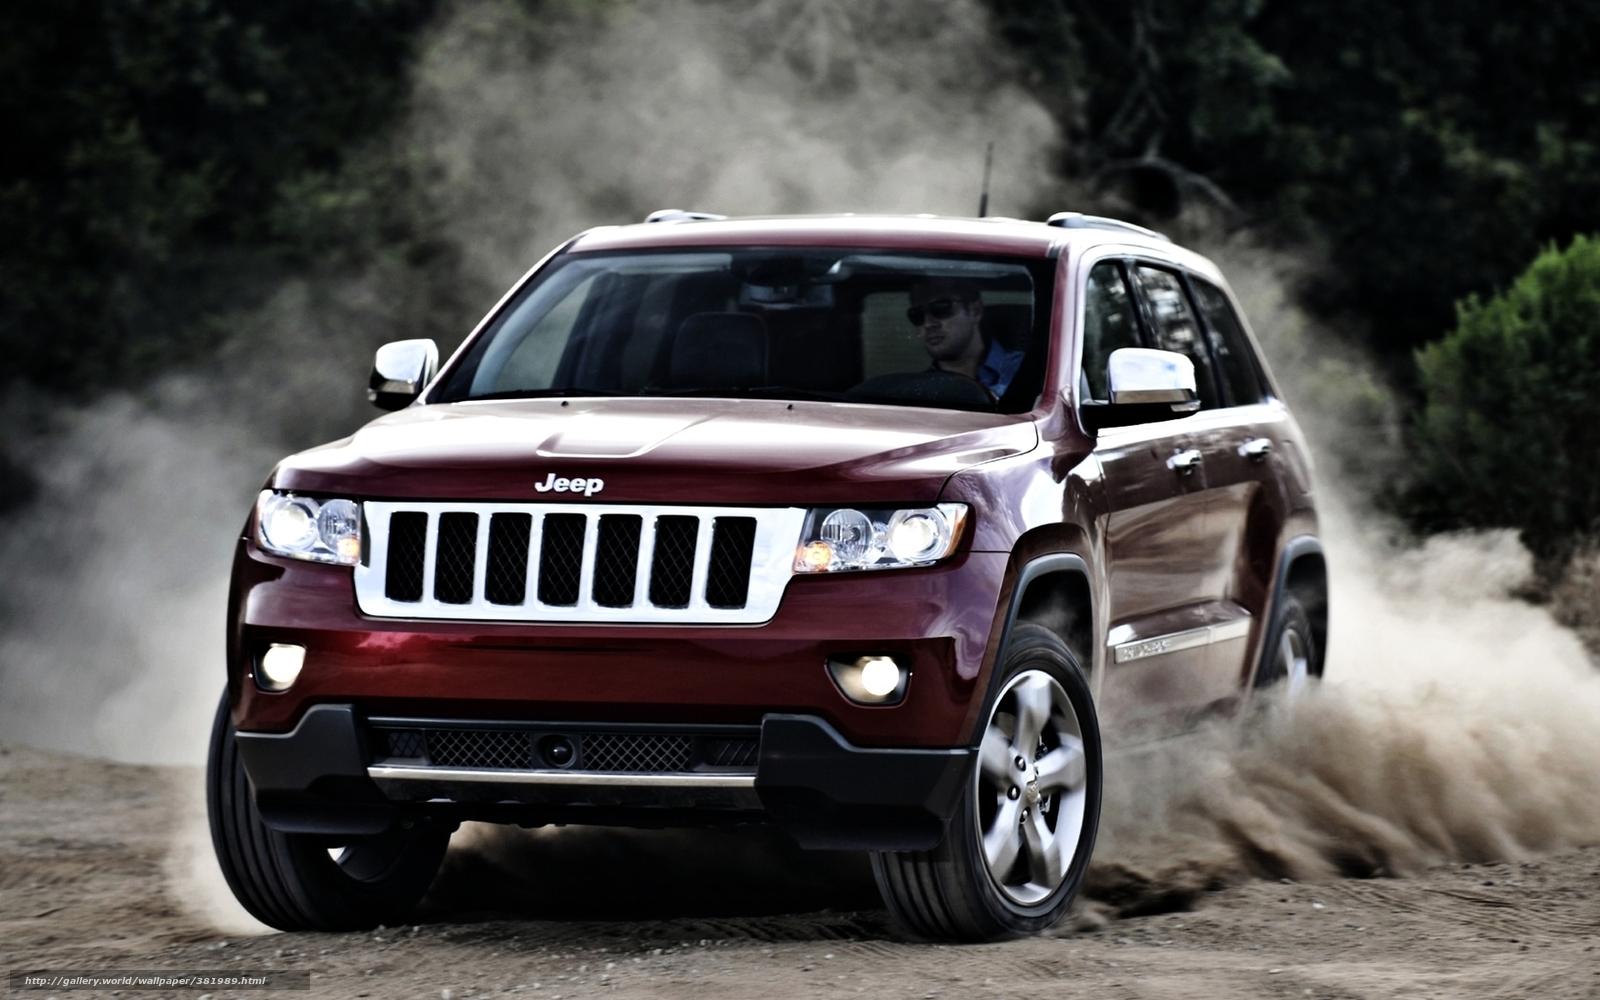 Tlcharger Fond d'ecran jeep, Grand Cherokee, VUS, avant Fonds d'ecran gratuits pour votre ...